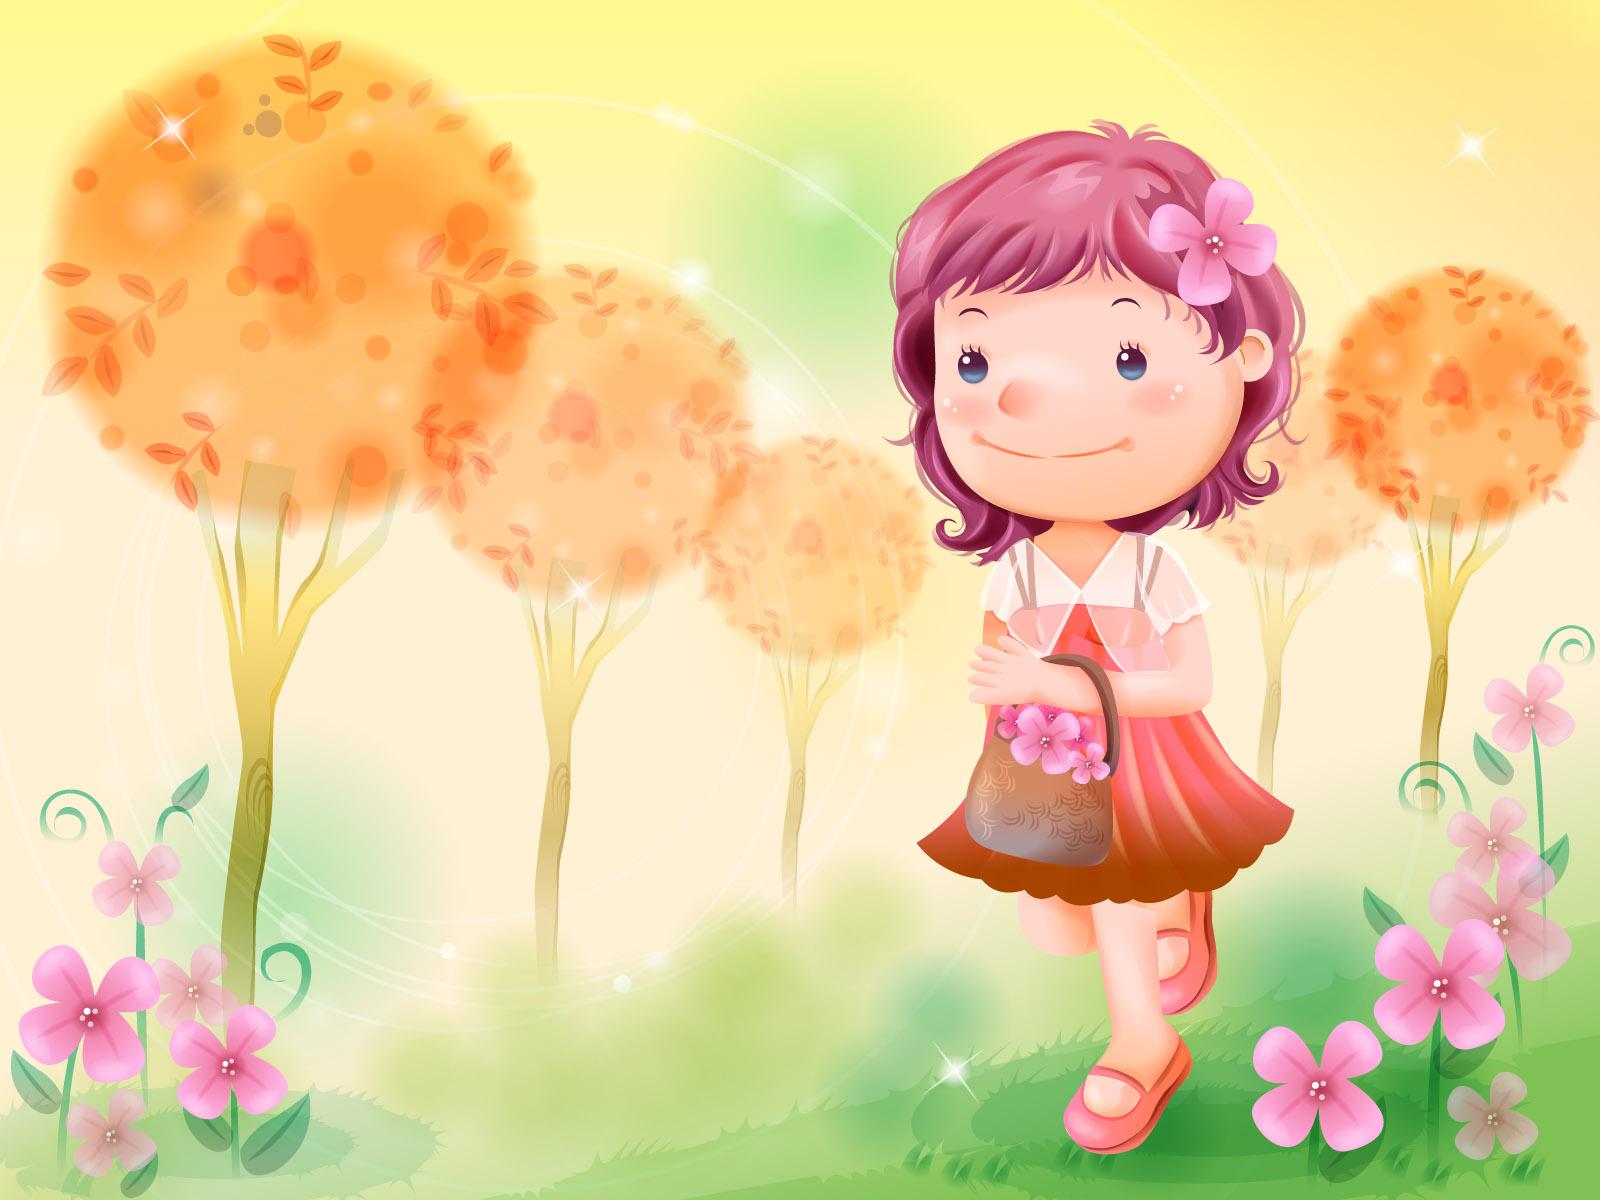 Cute Girly Girl Wallpapers Иллюстрации для детей 161 фото 187 Страница 2 187 Картины